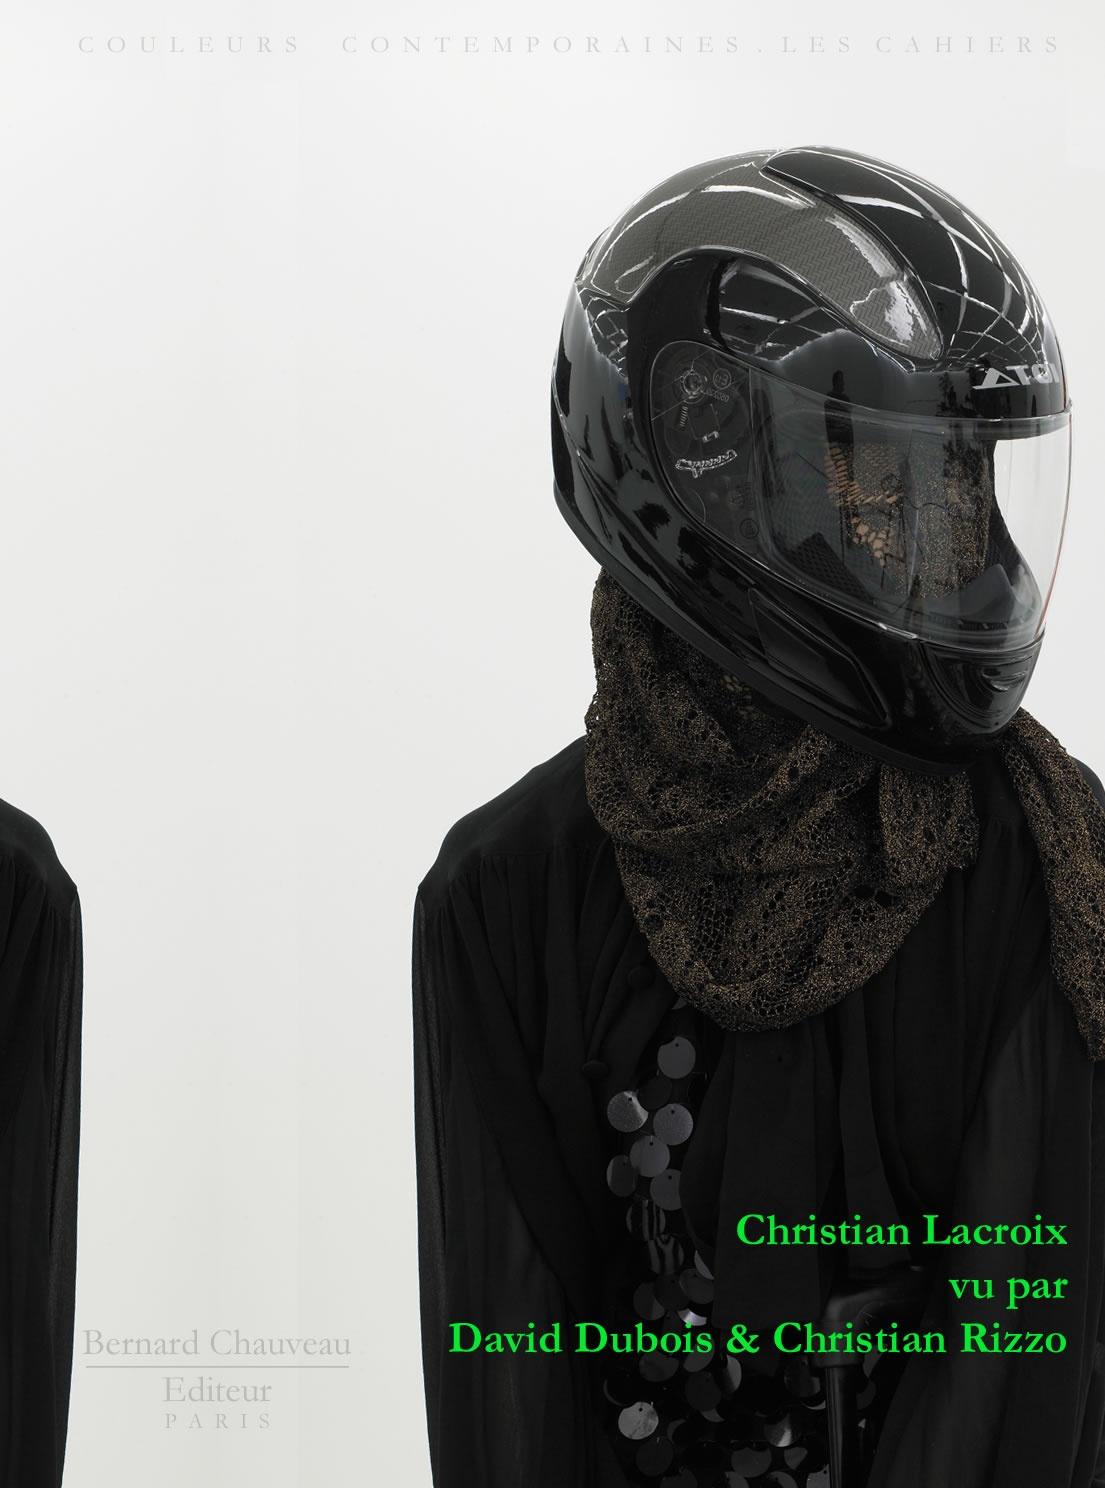 christian lacroix vu par david dubois et christian rizzo - bernard